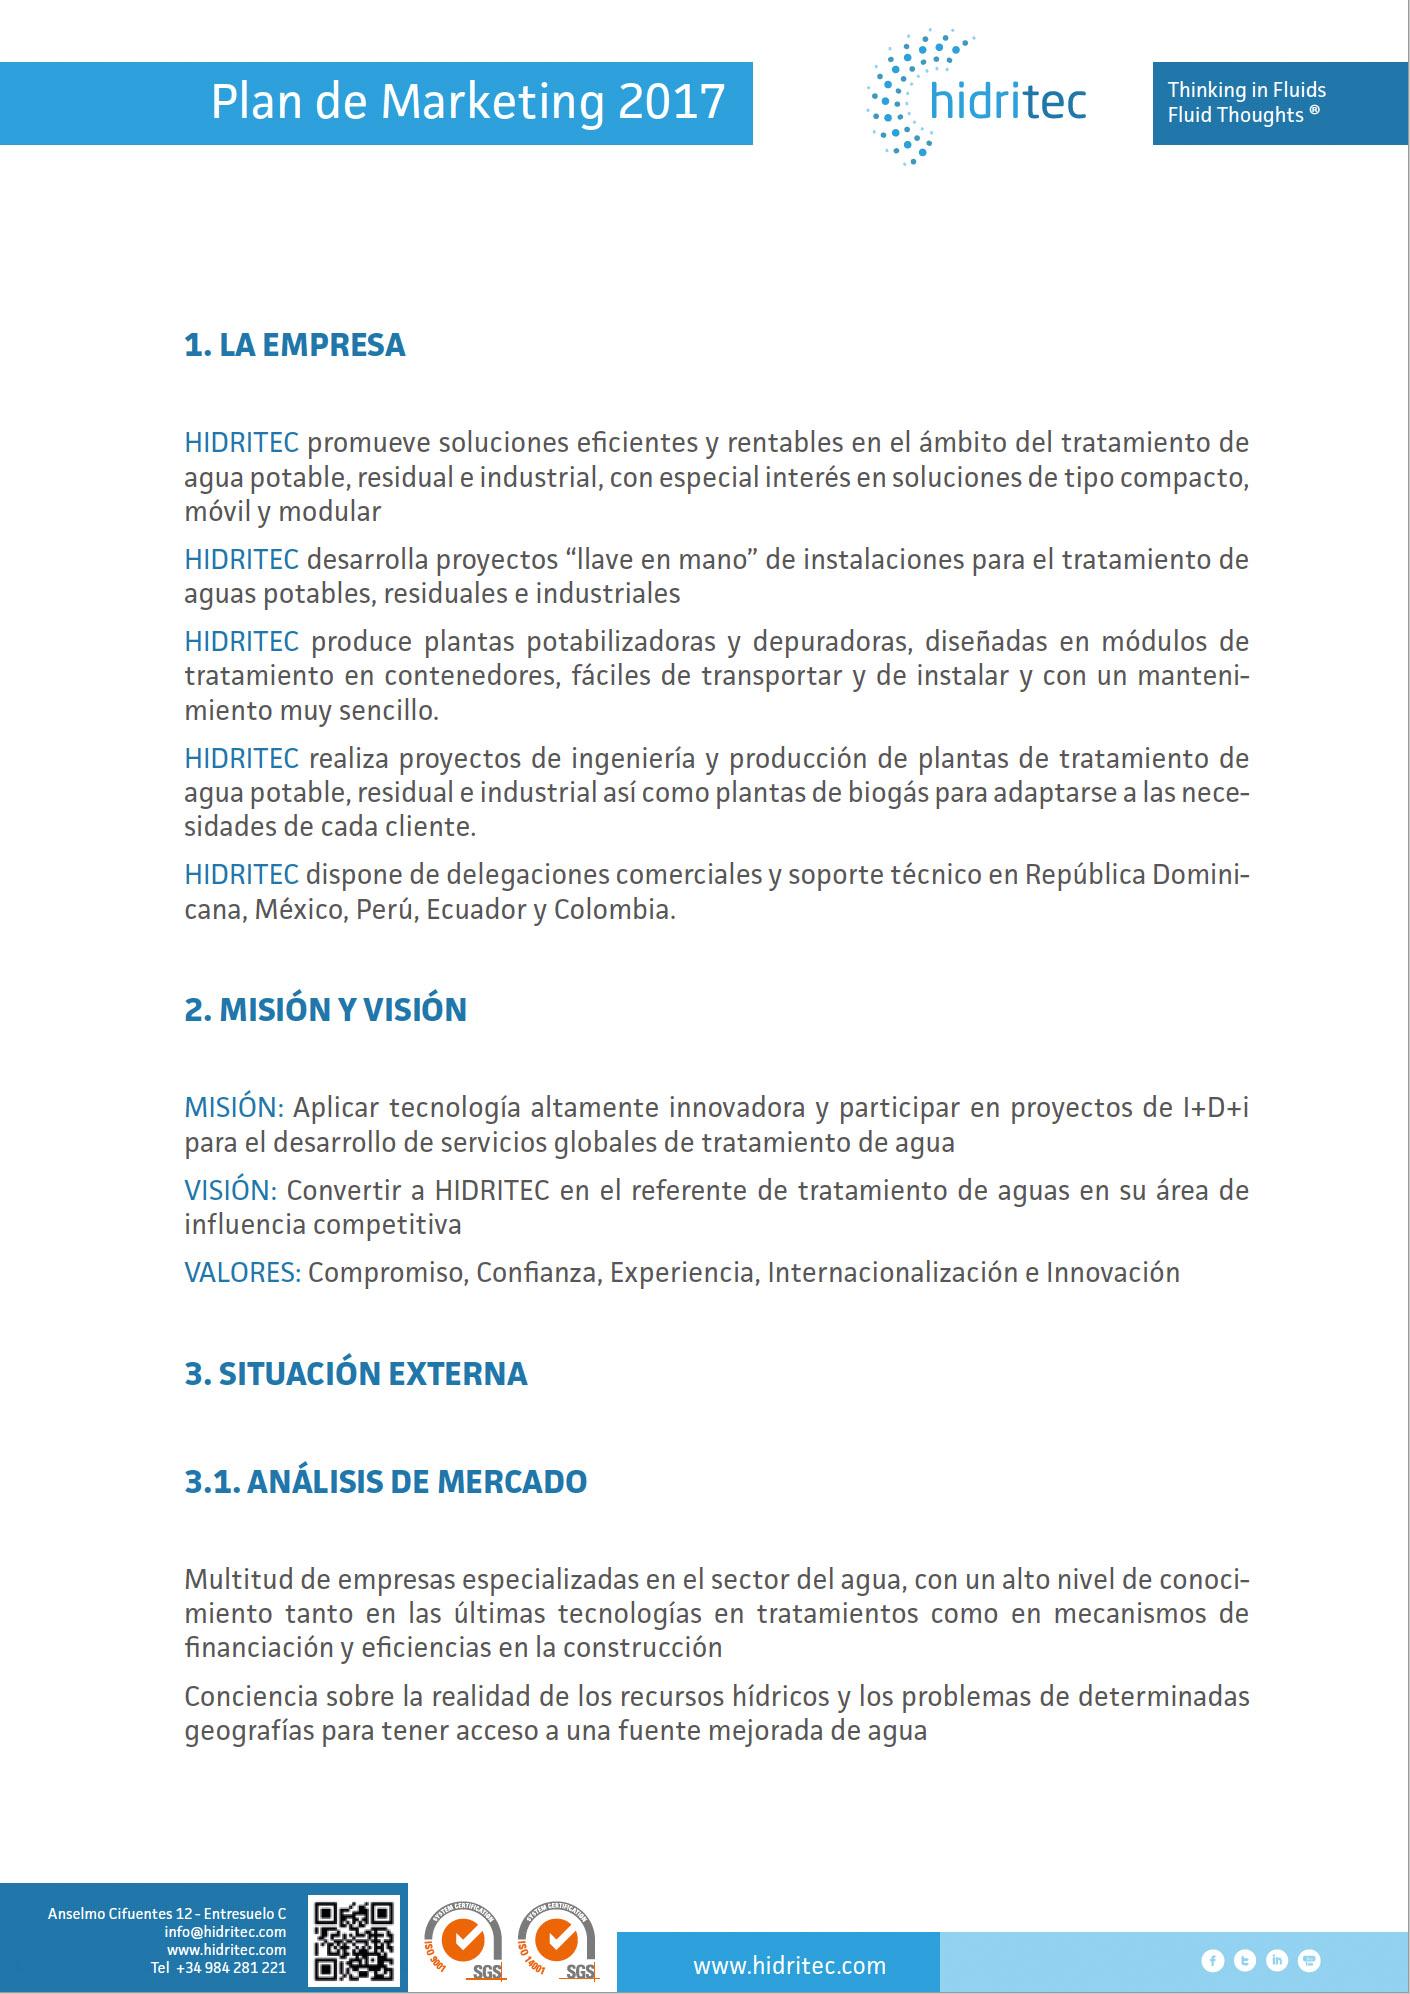 Plan de Markting Hidritec interior